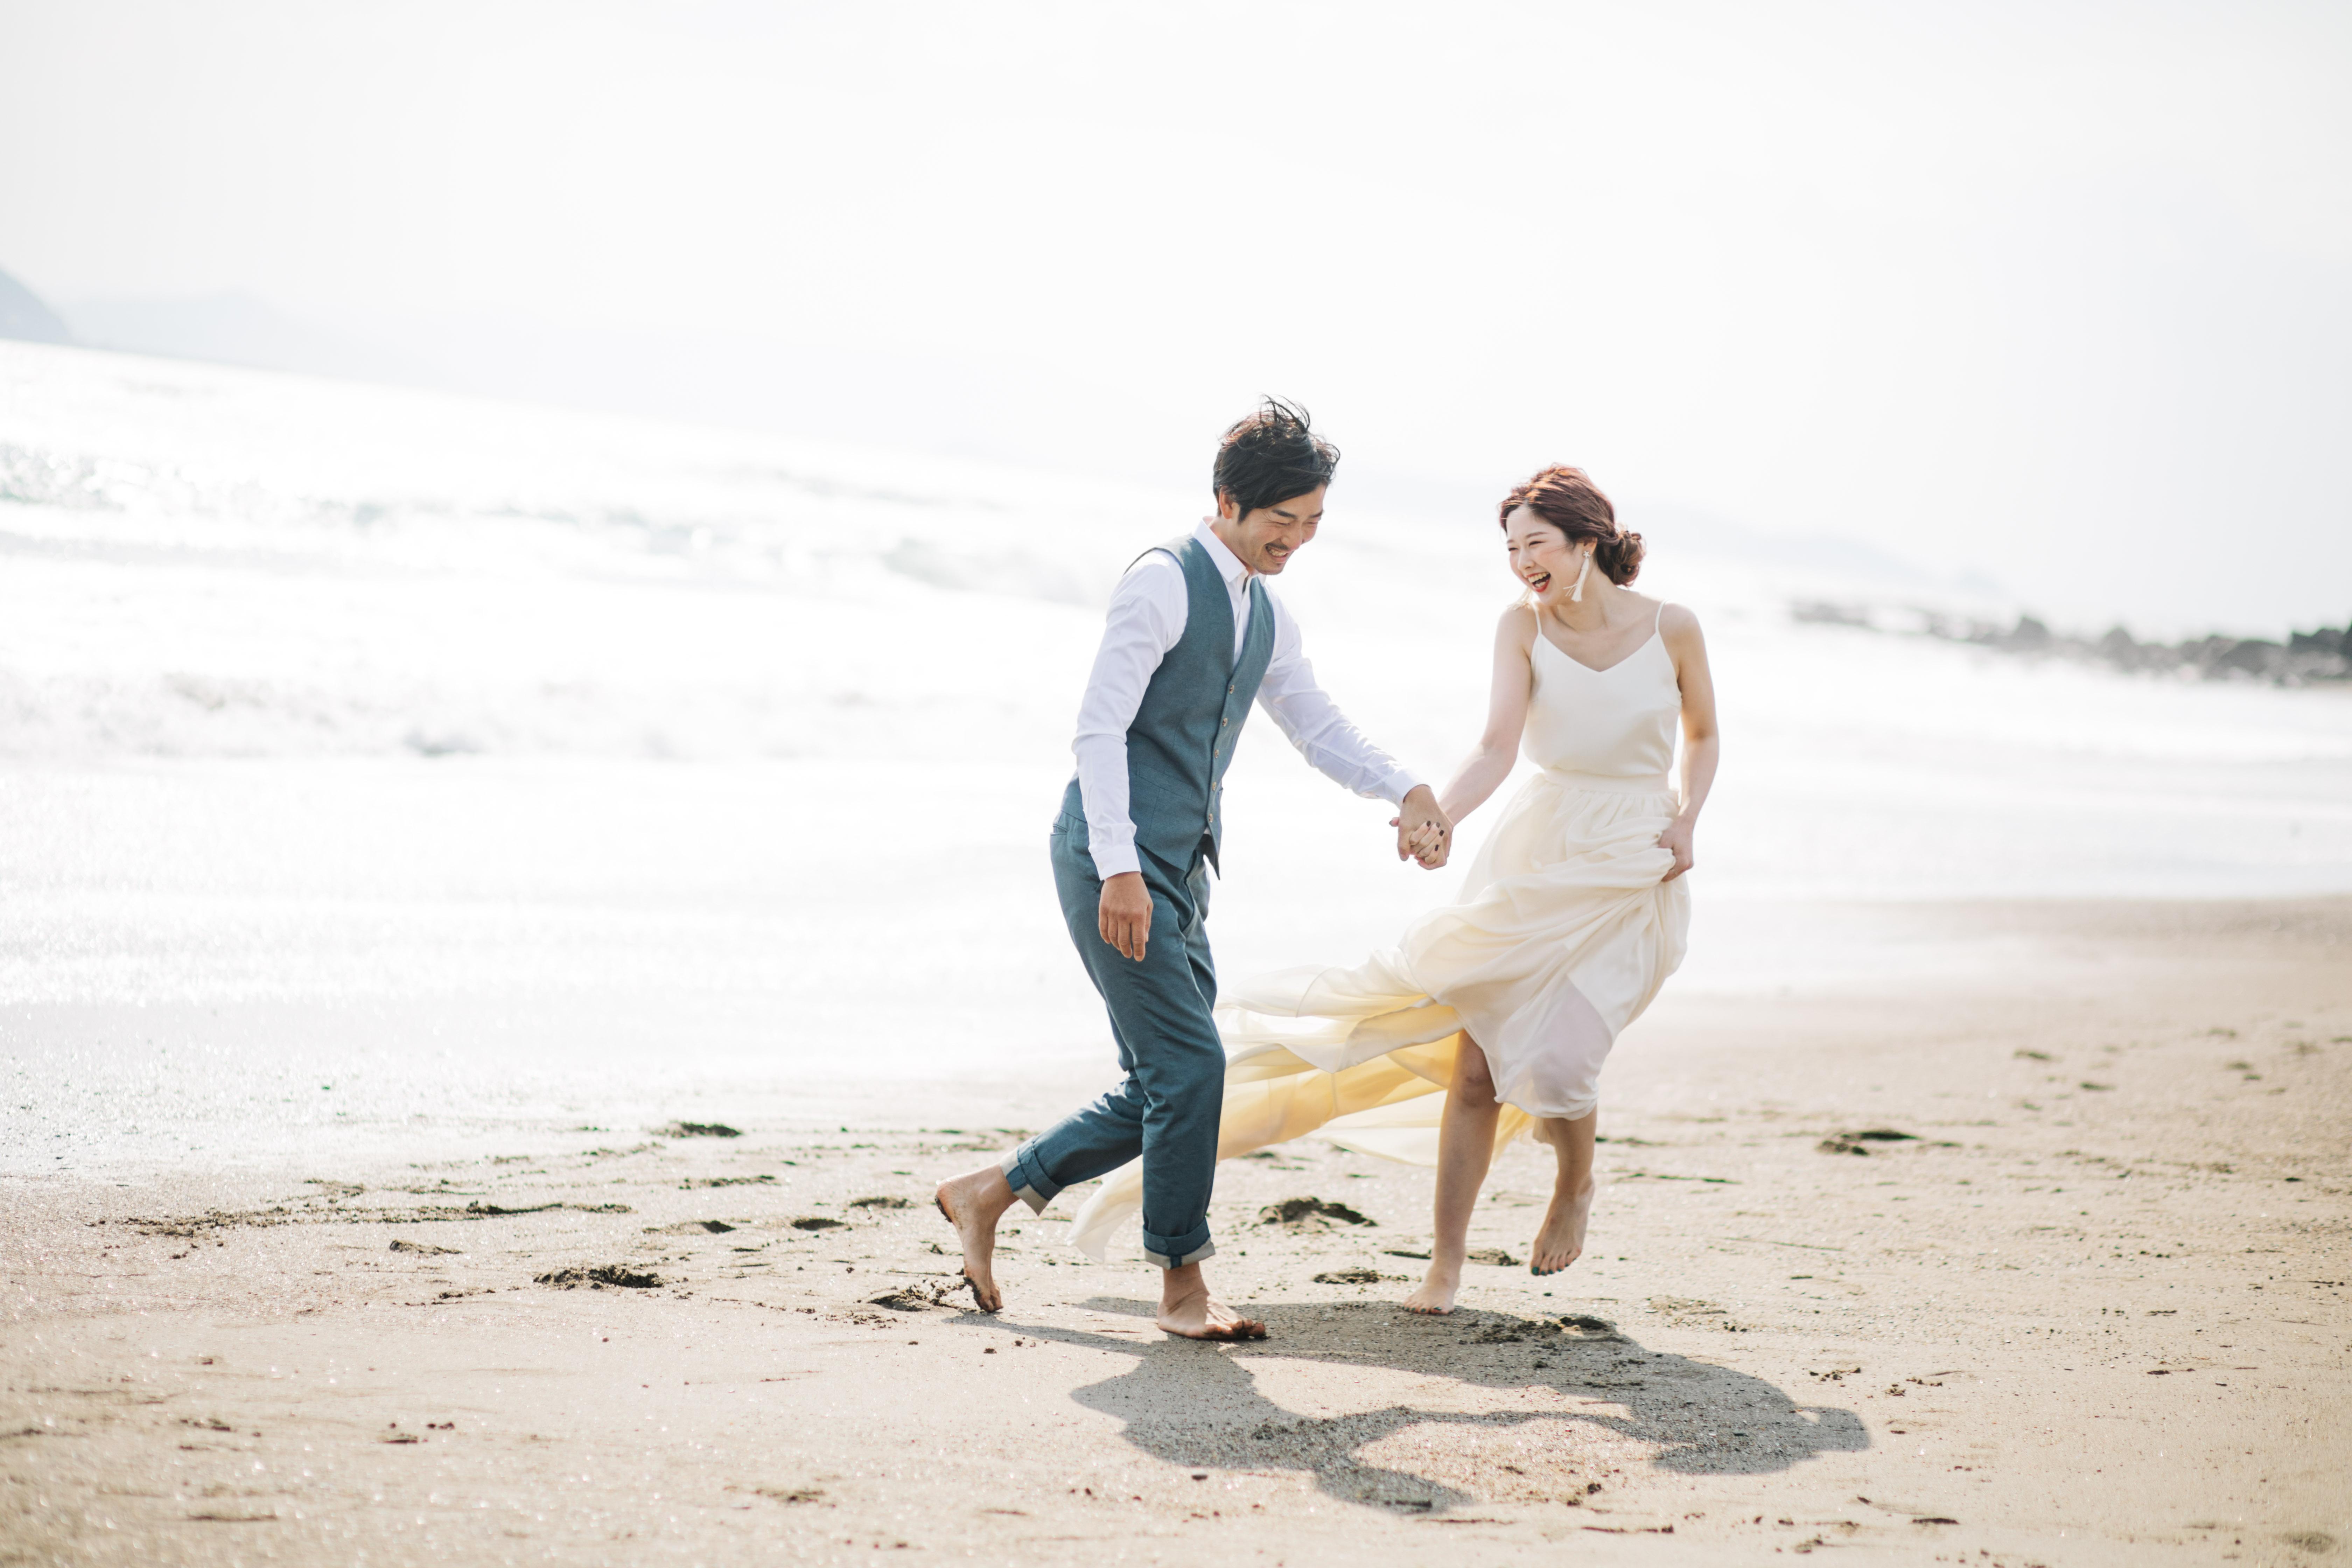 LAPPLE前撮りプラン!自然体な夫婦の姿を撮影してもらえる結婚写真